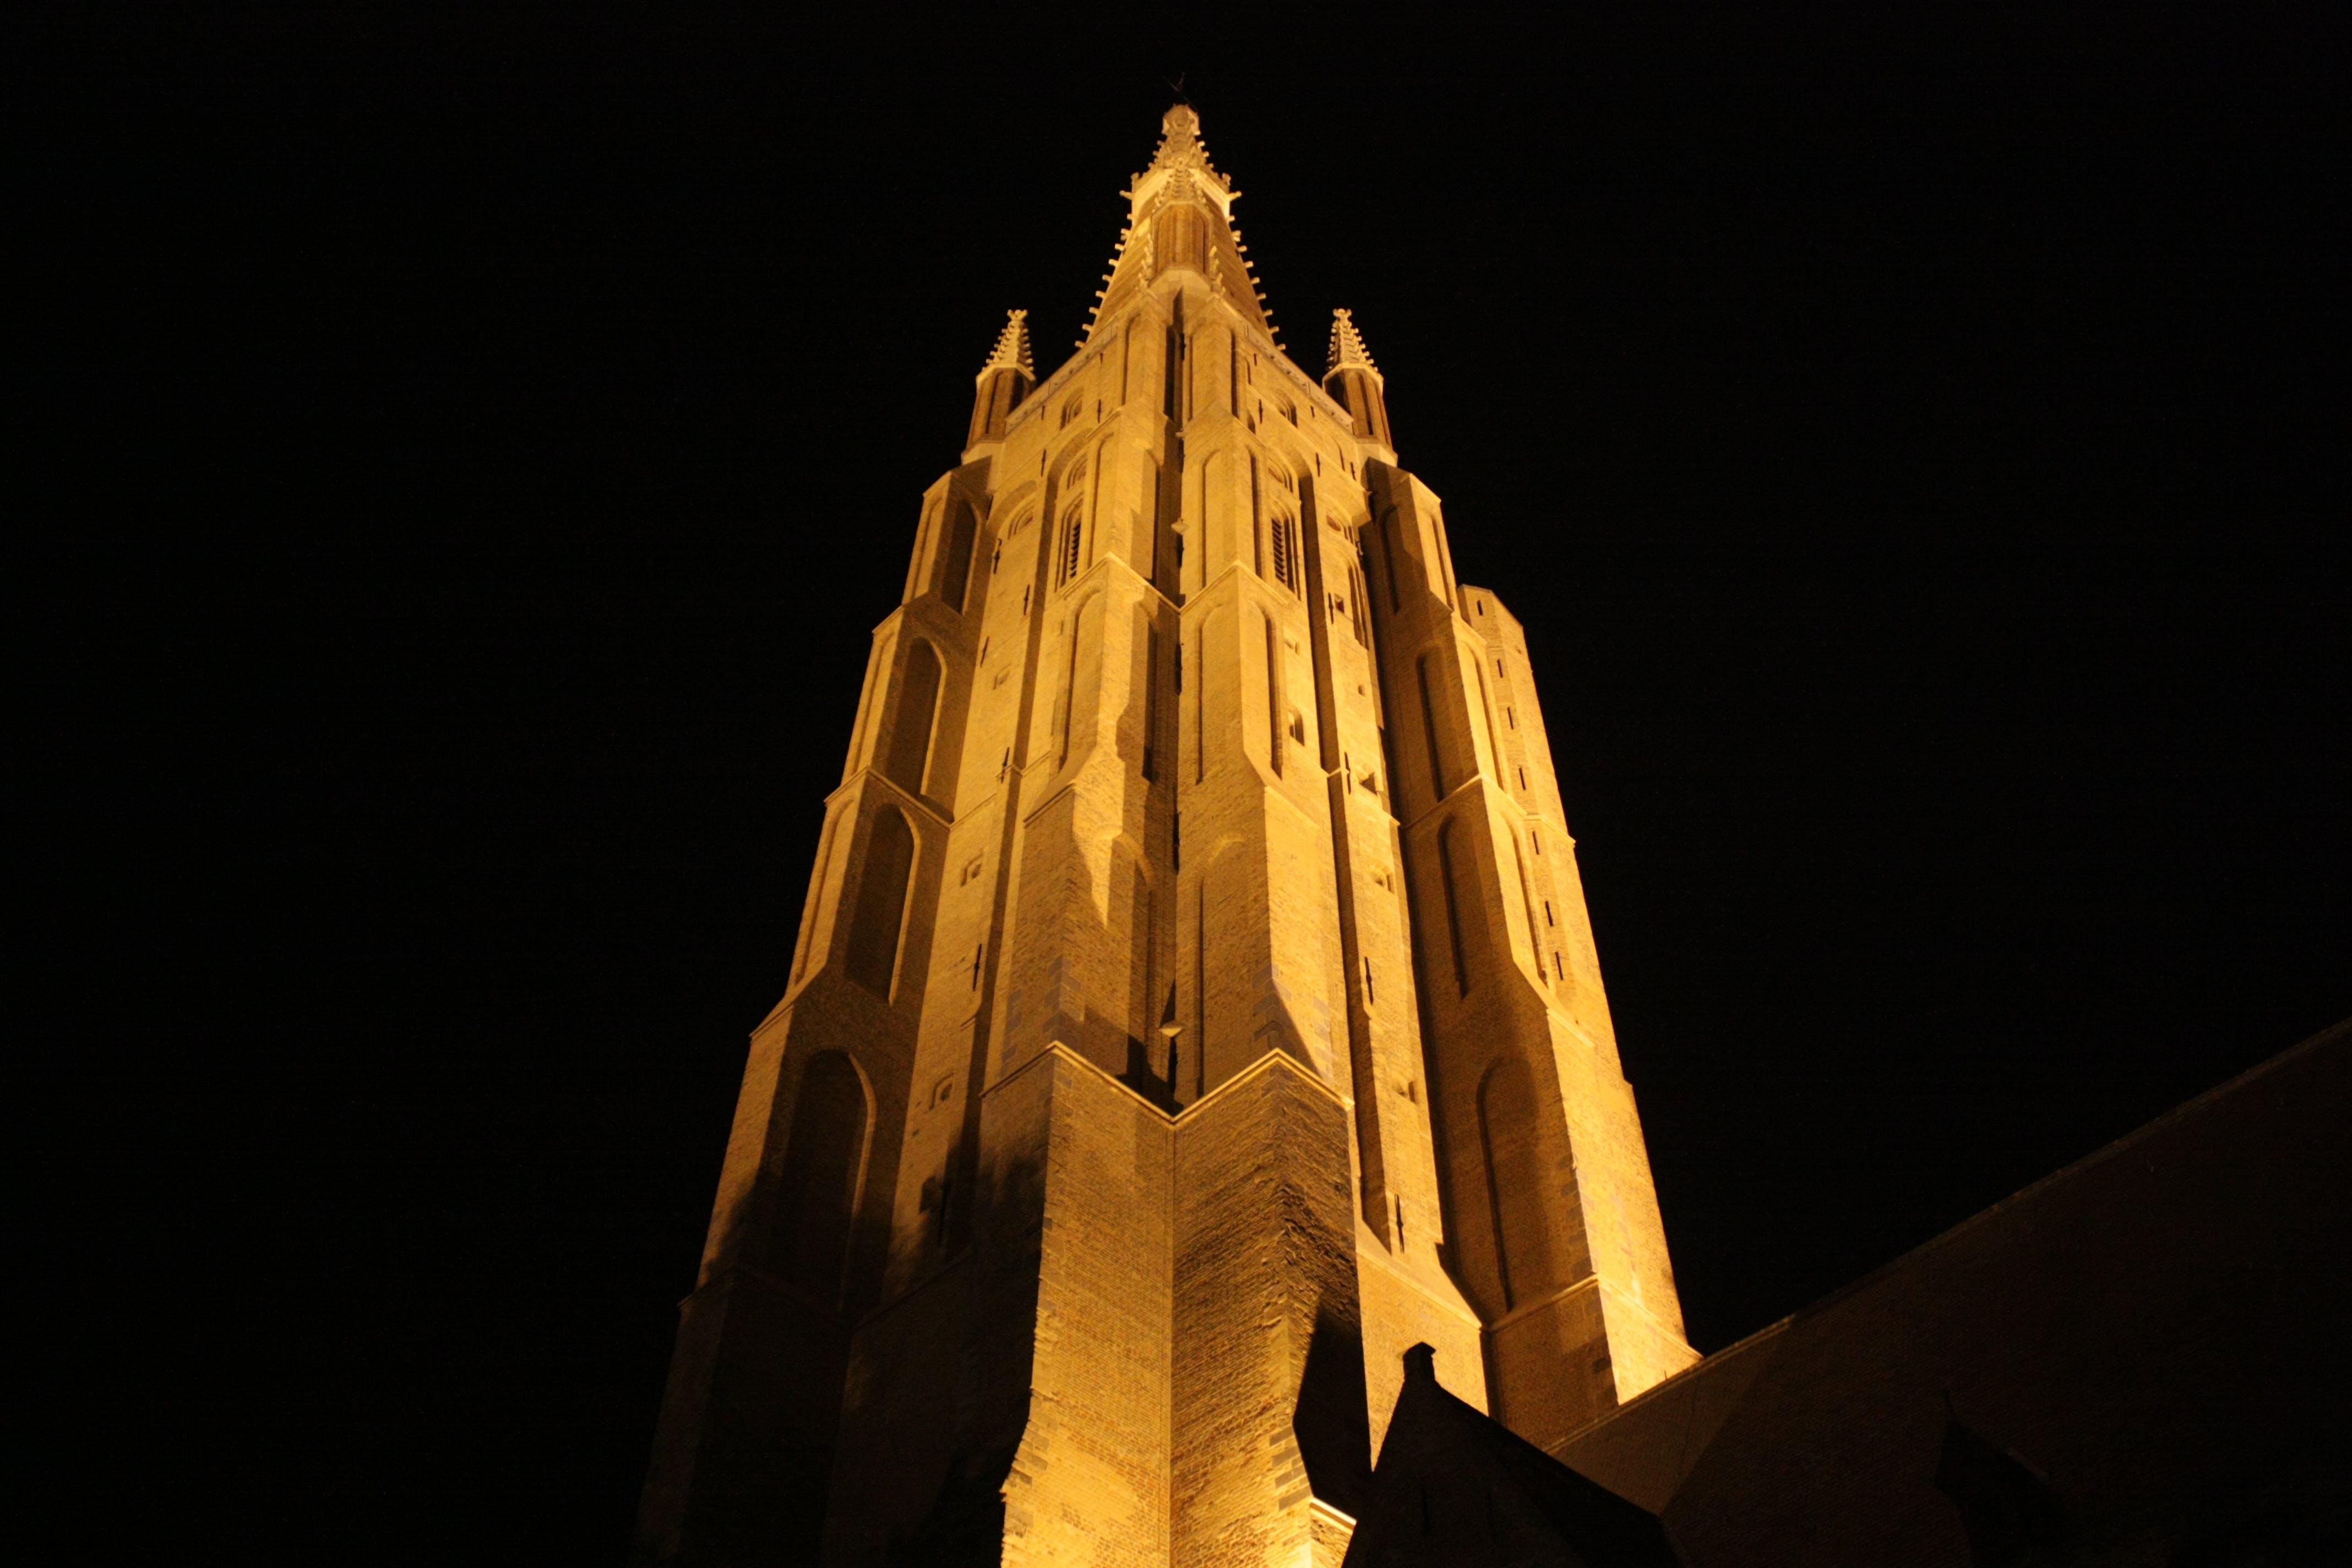 Fotos de stock gratuitas de Bélgica, brujas, Iglesia, luces